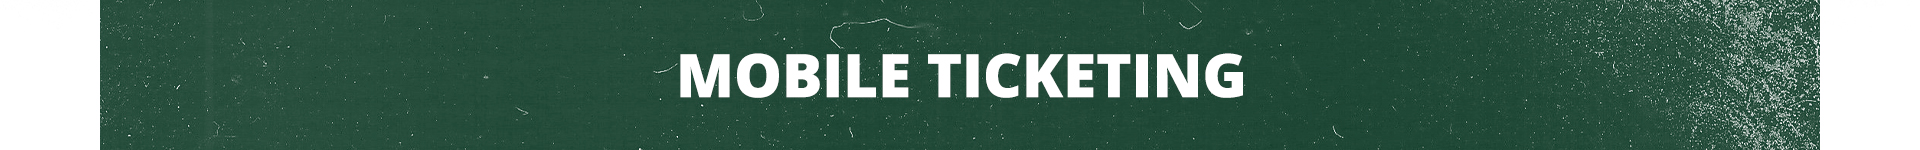 TicketLandingPage_08